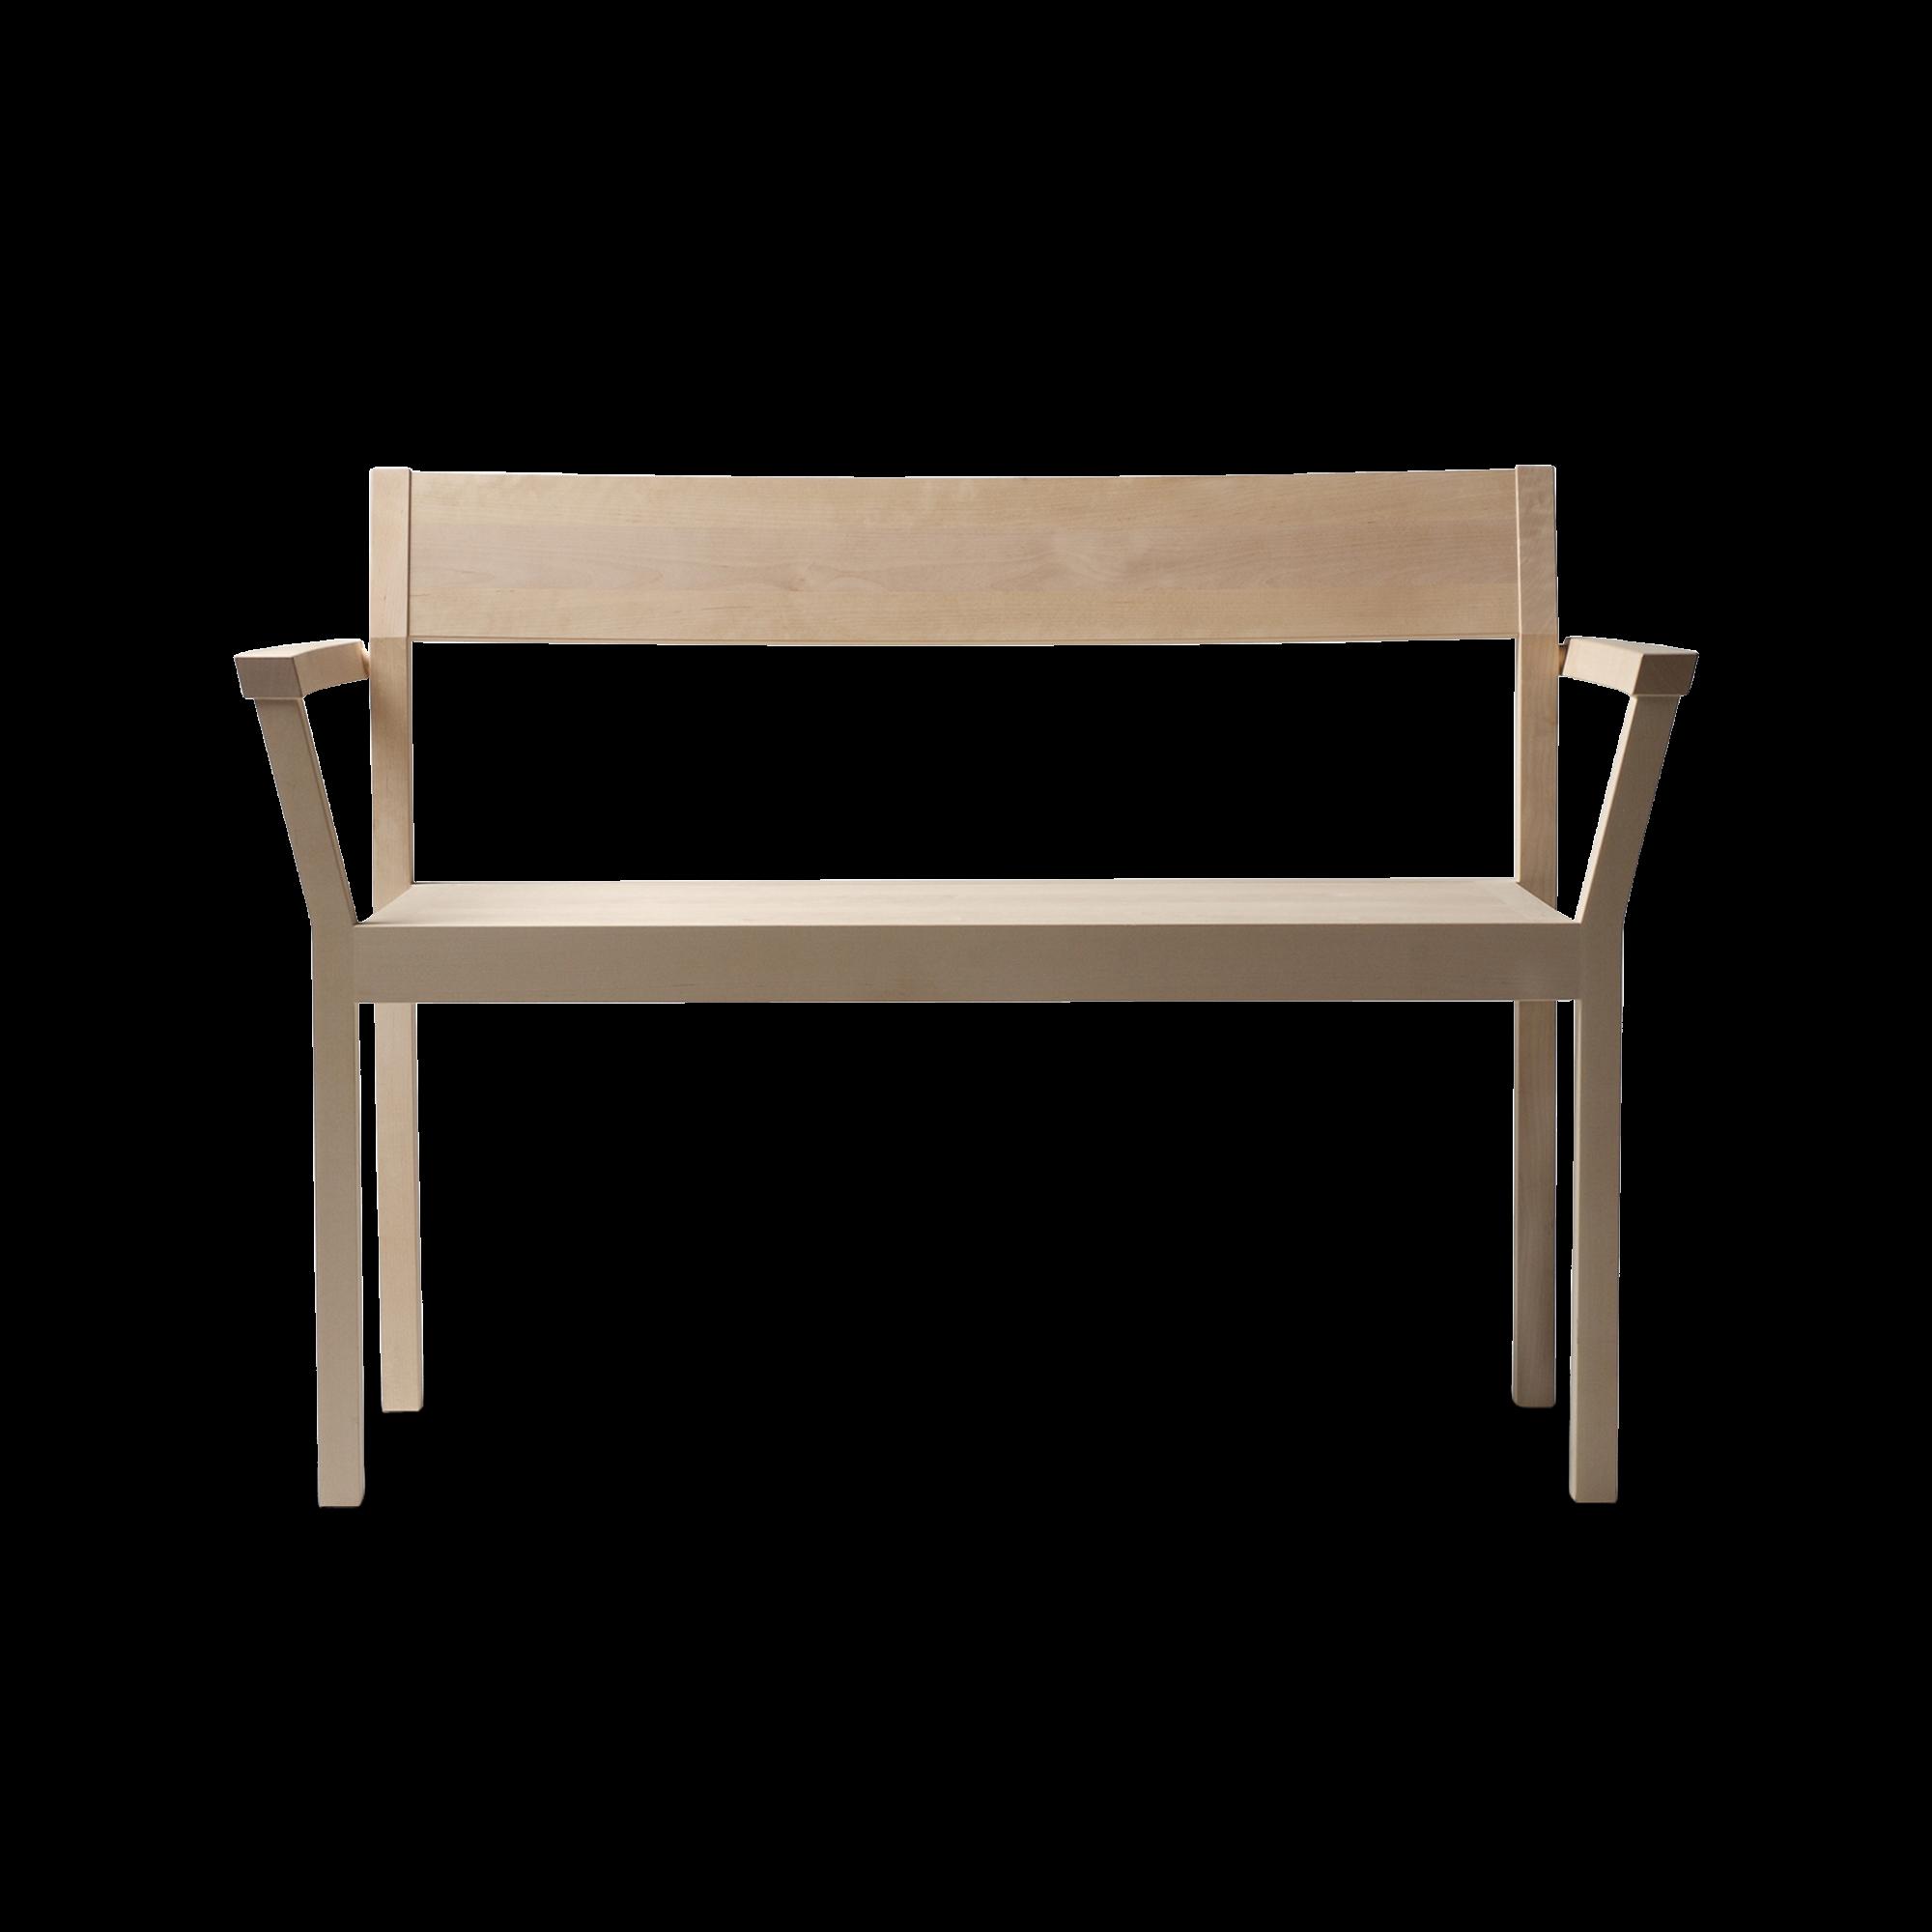 periferia-kvt5-bench